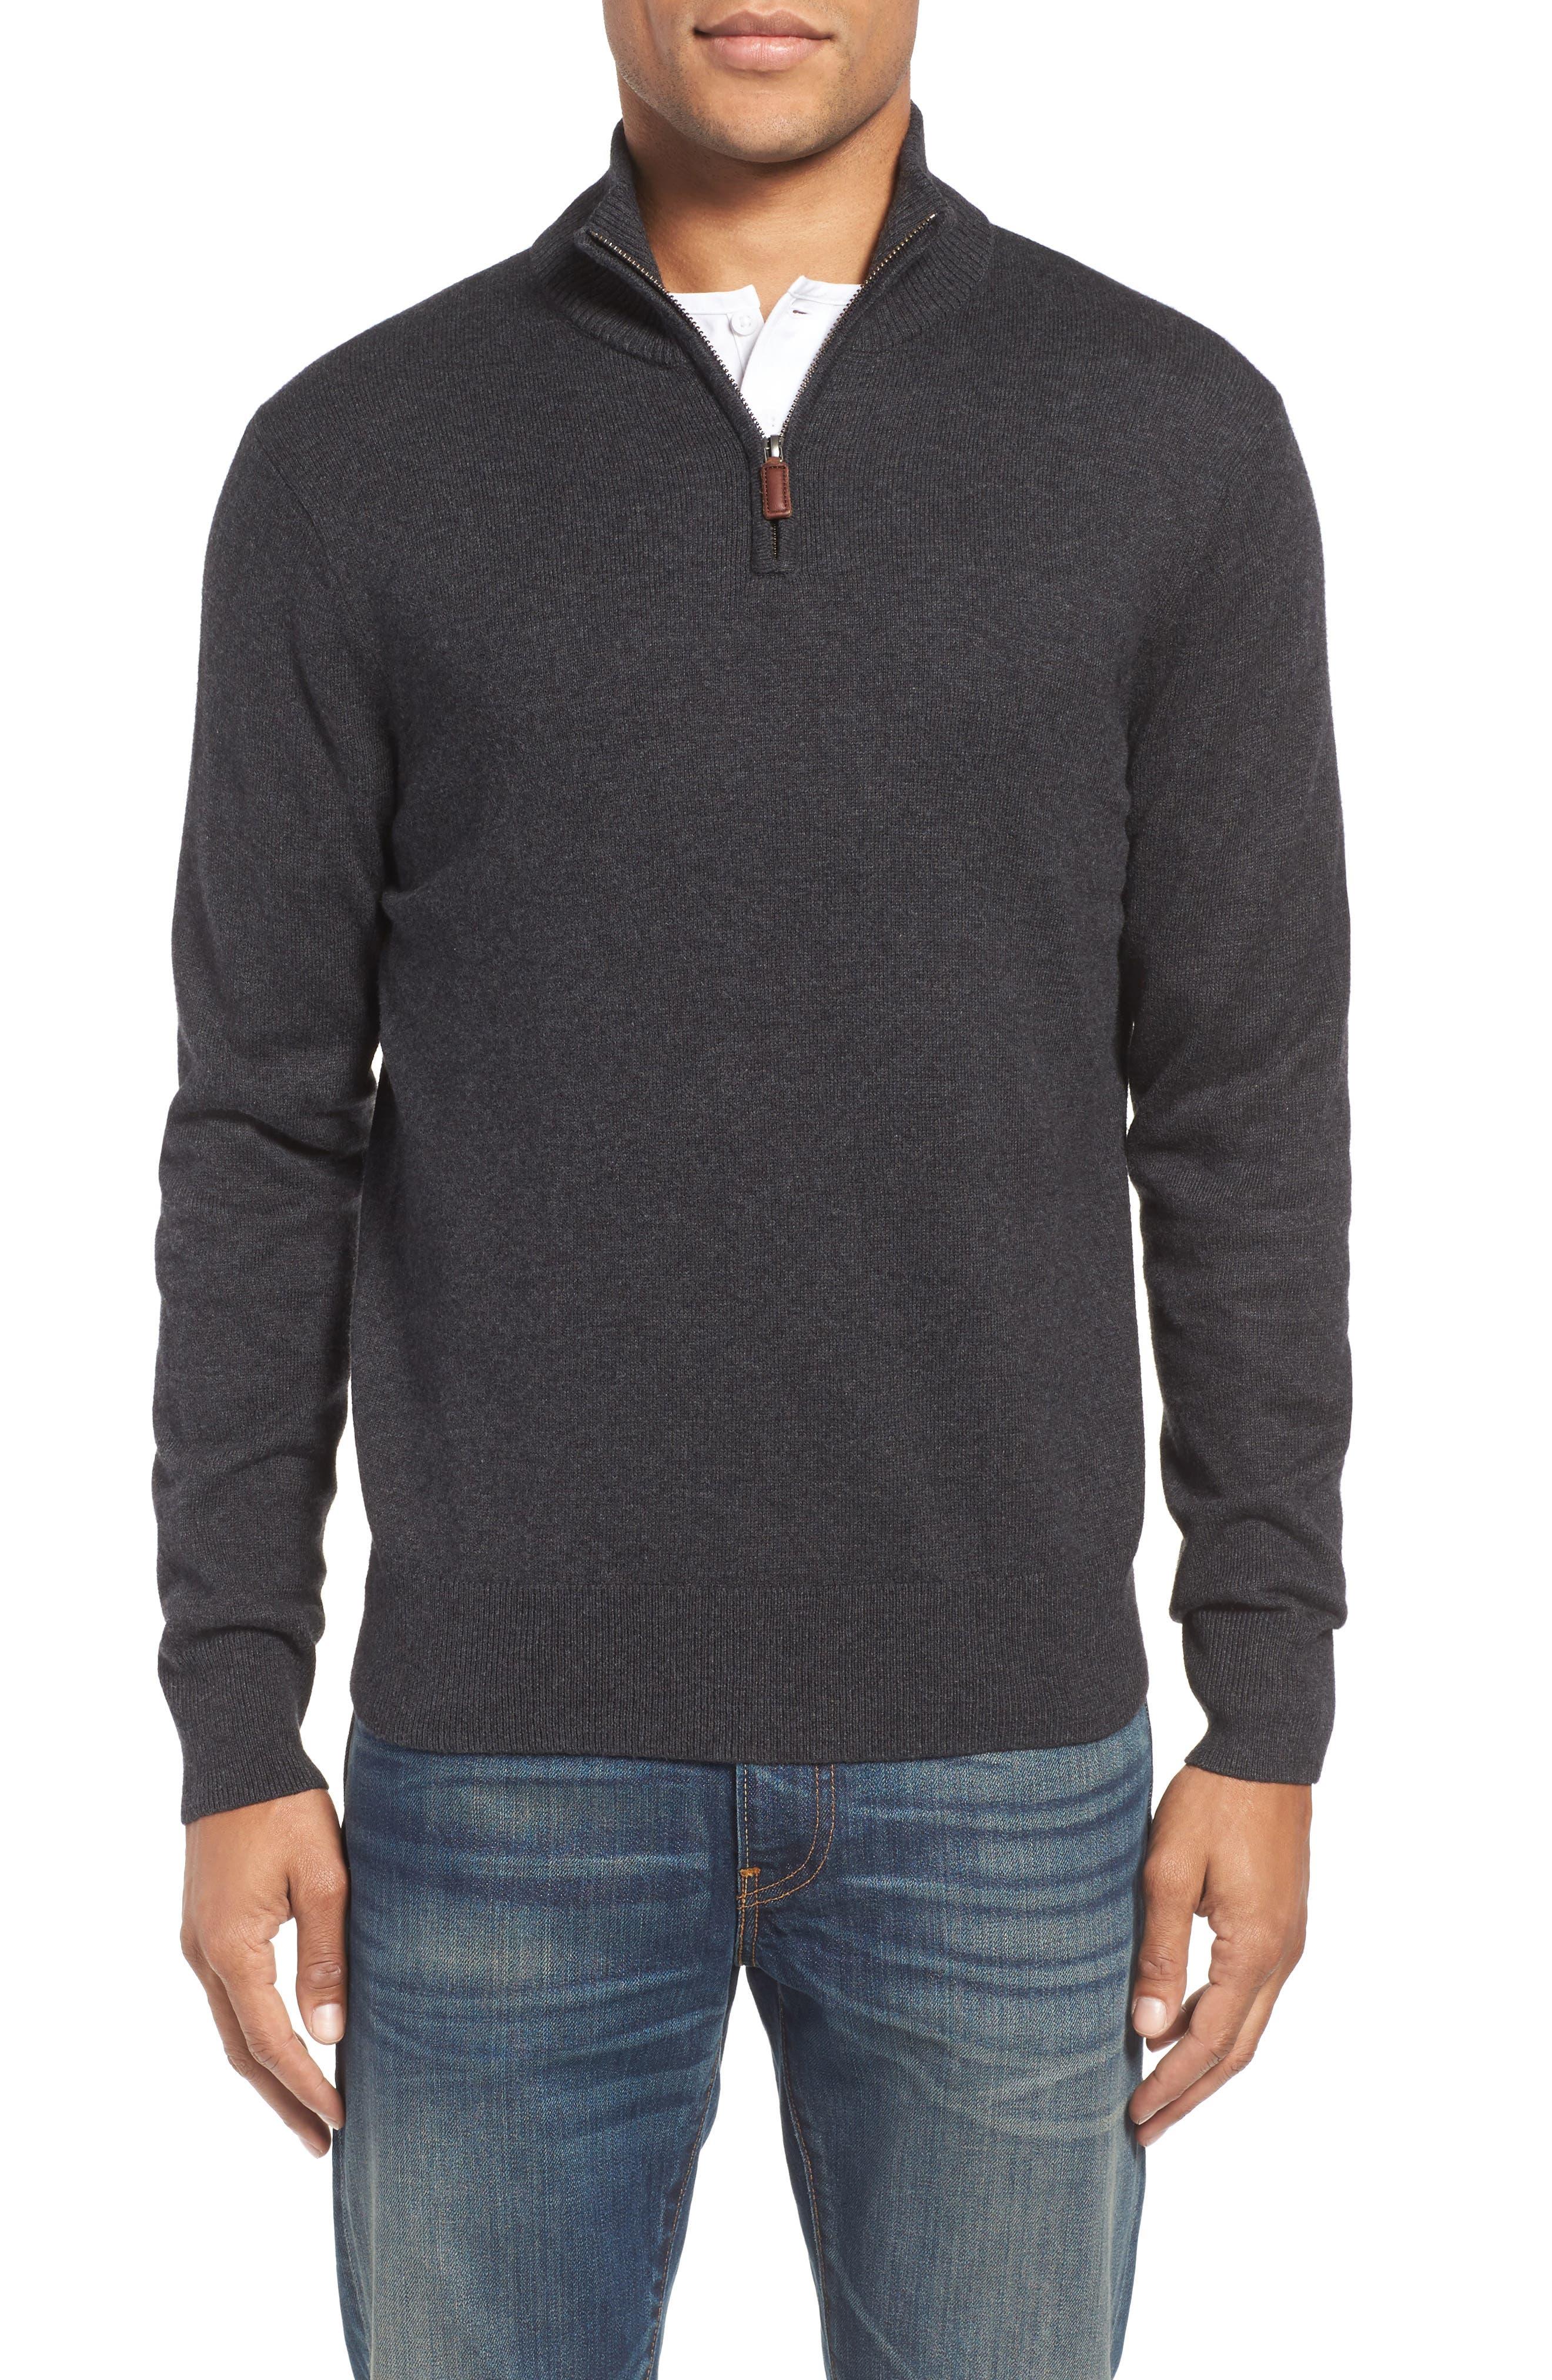 Alternate Image 1 Selected - Bonobos Cotton & Cashmere Quarter Zip Sweater